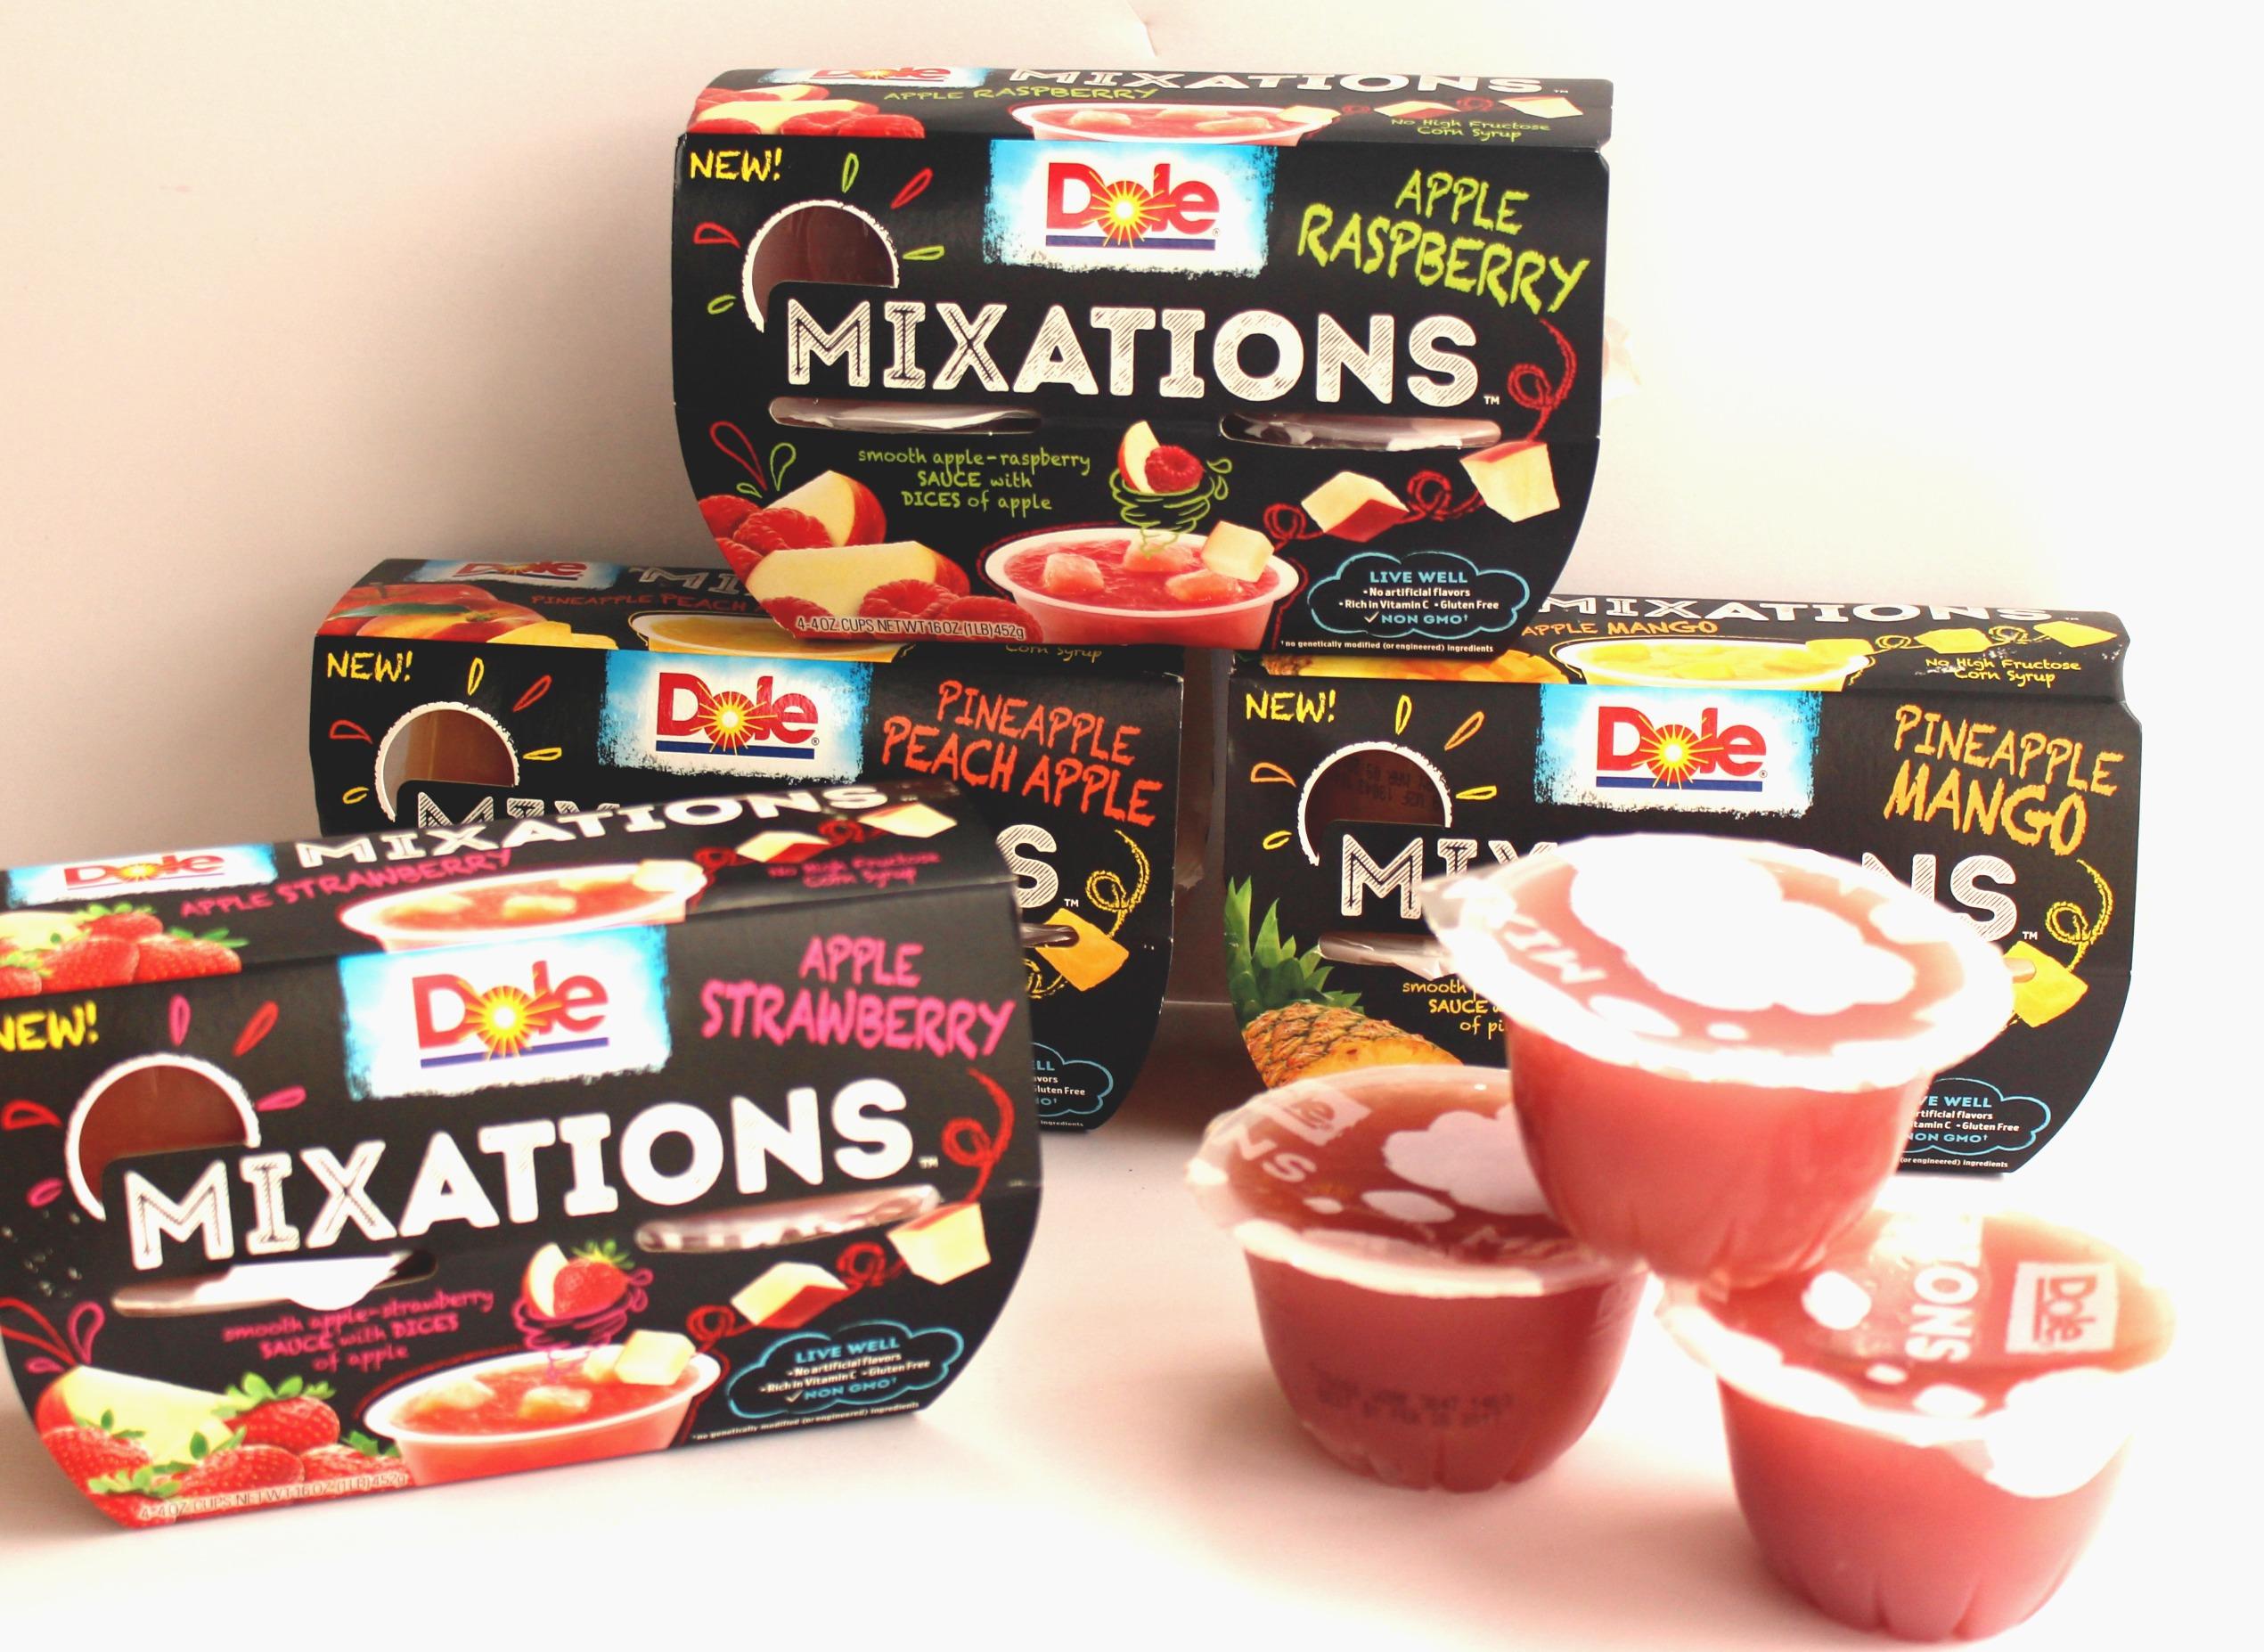 Dole-Mixations